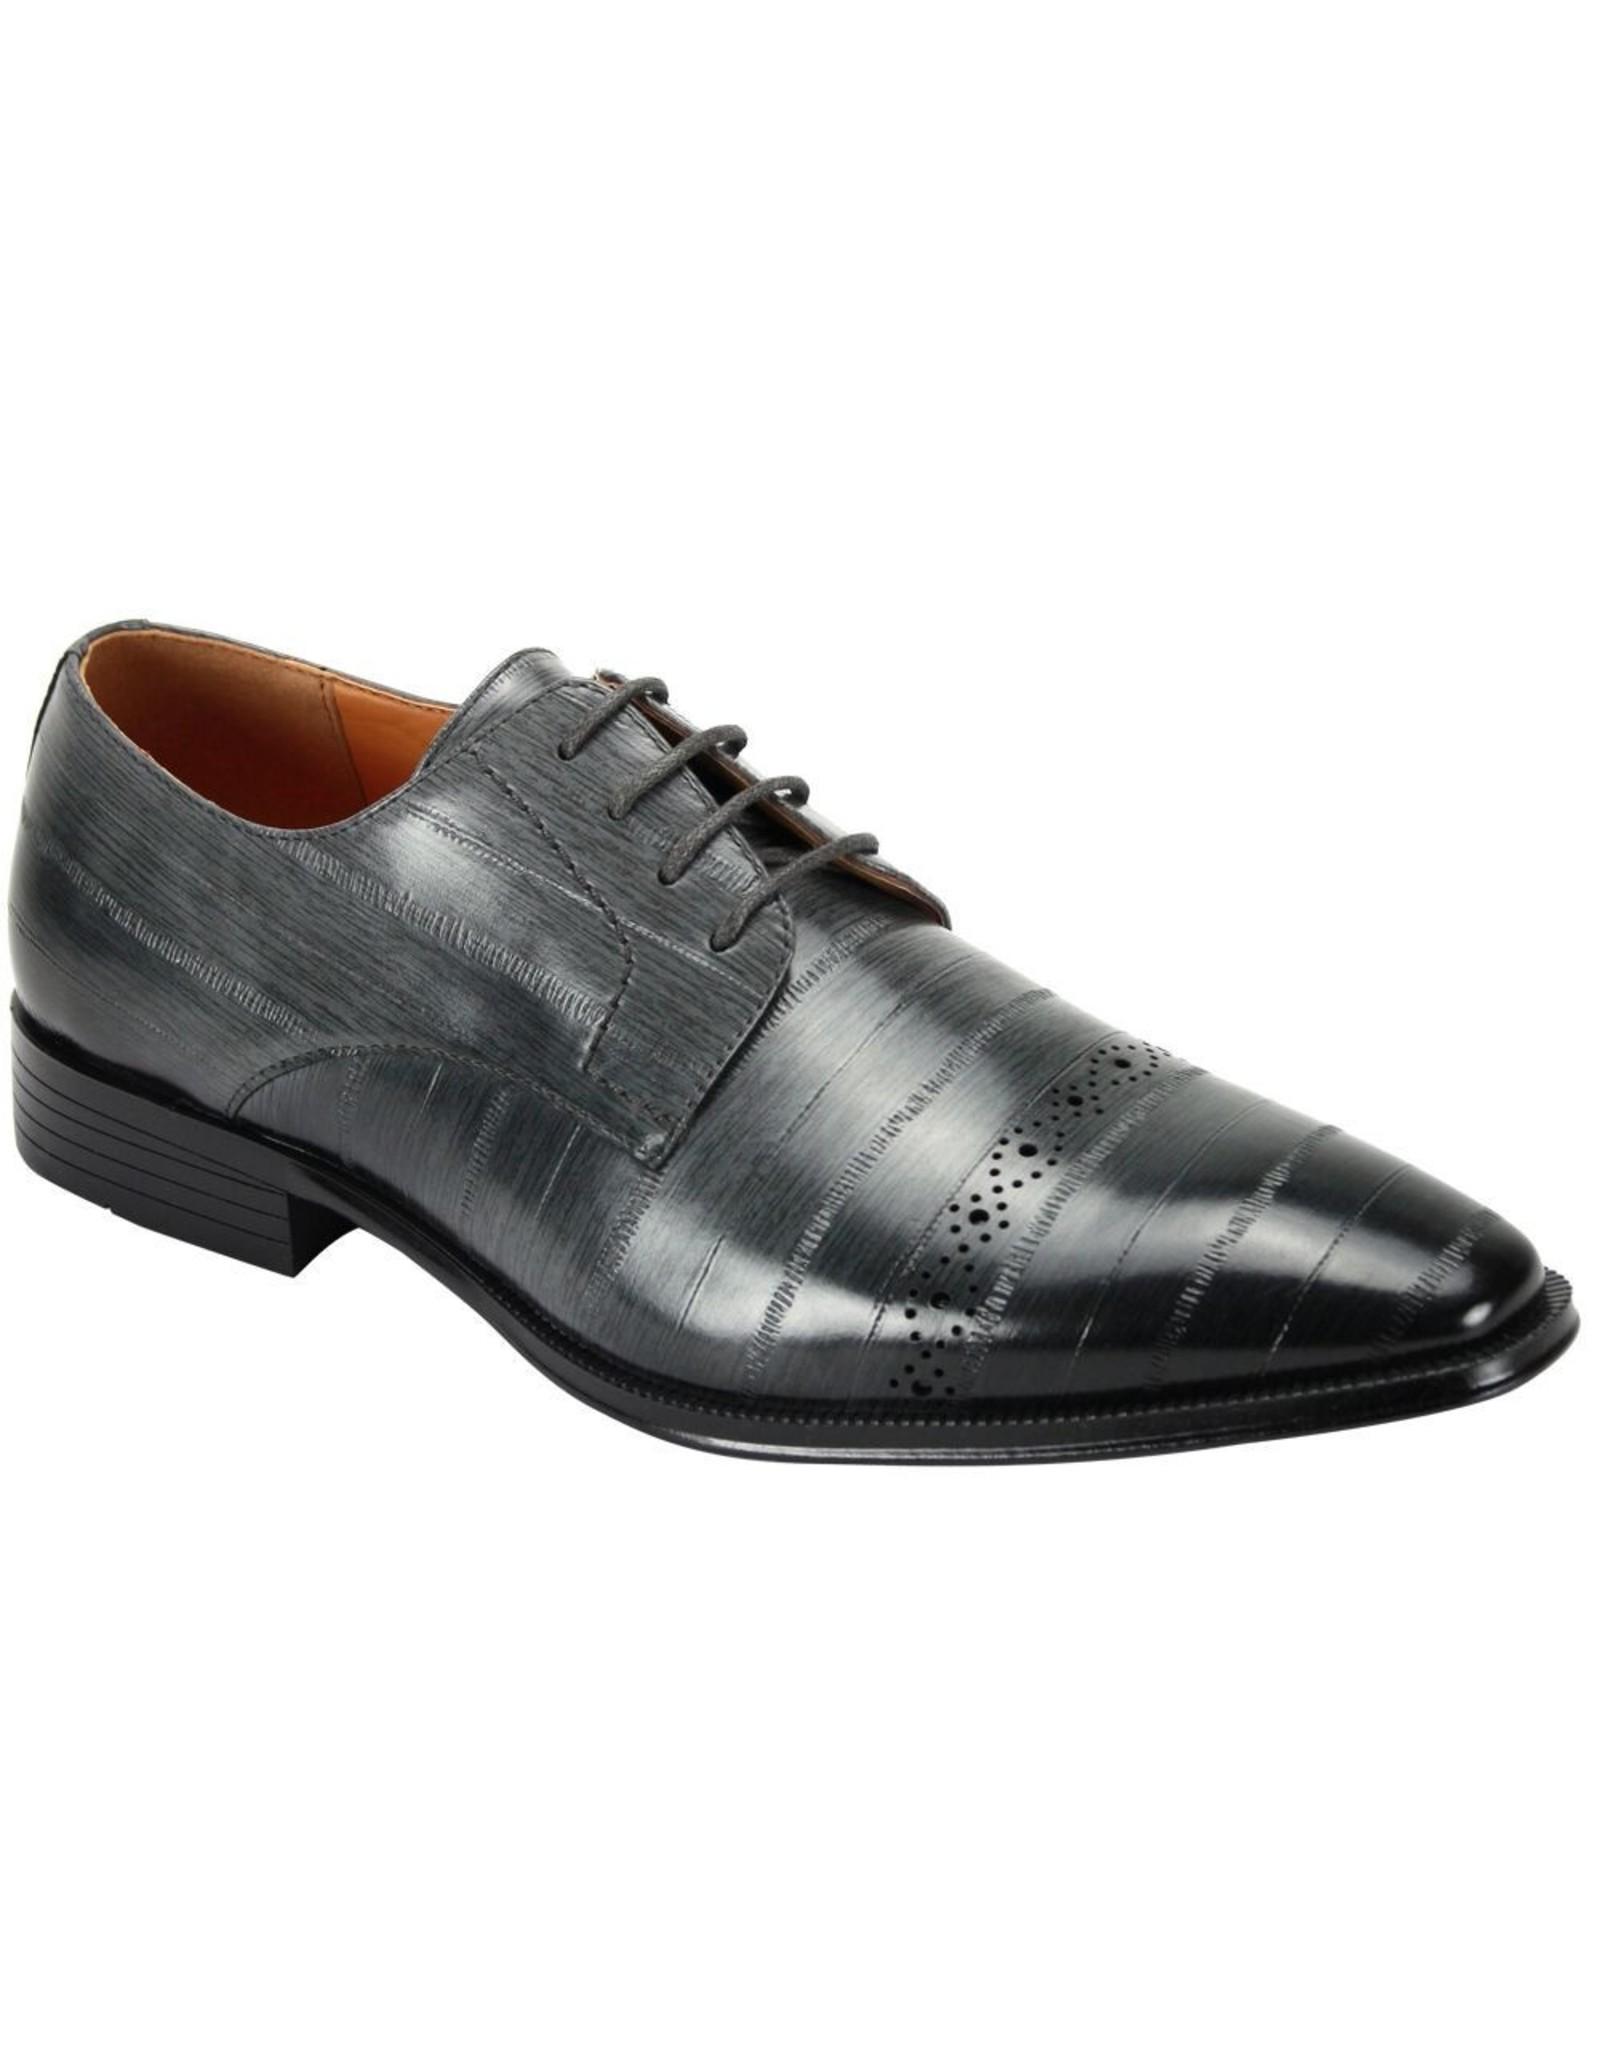 Antonio Cerrelli Antonio Cerrelli 6838 Dress Shoe - Gray